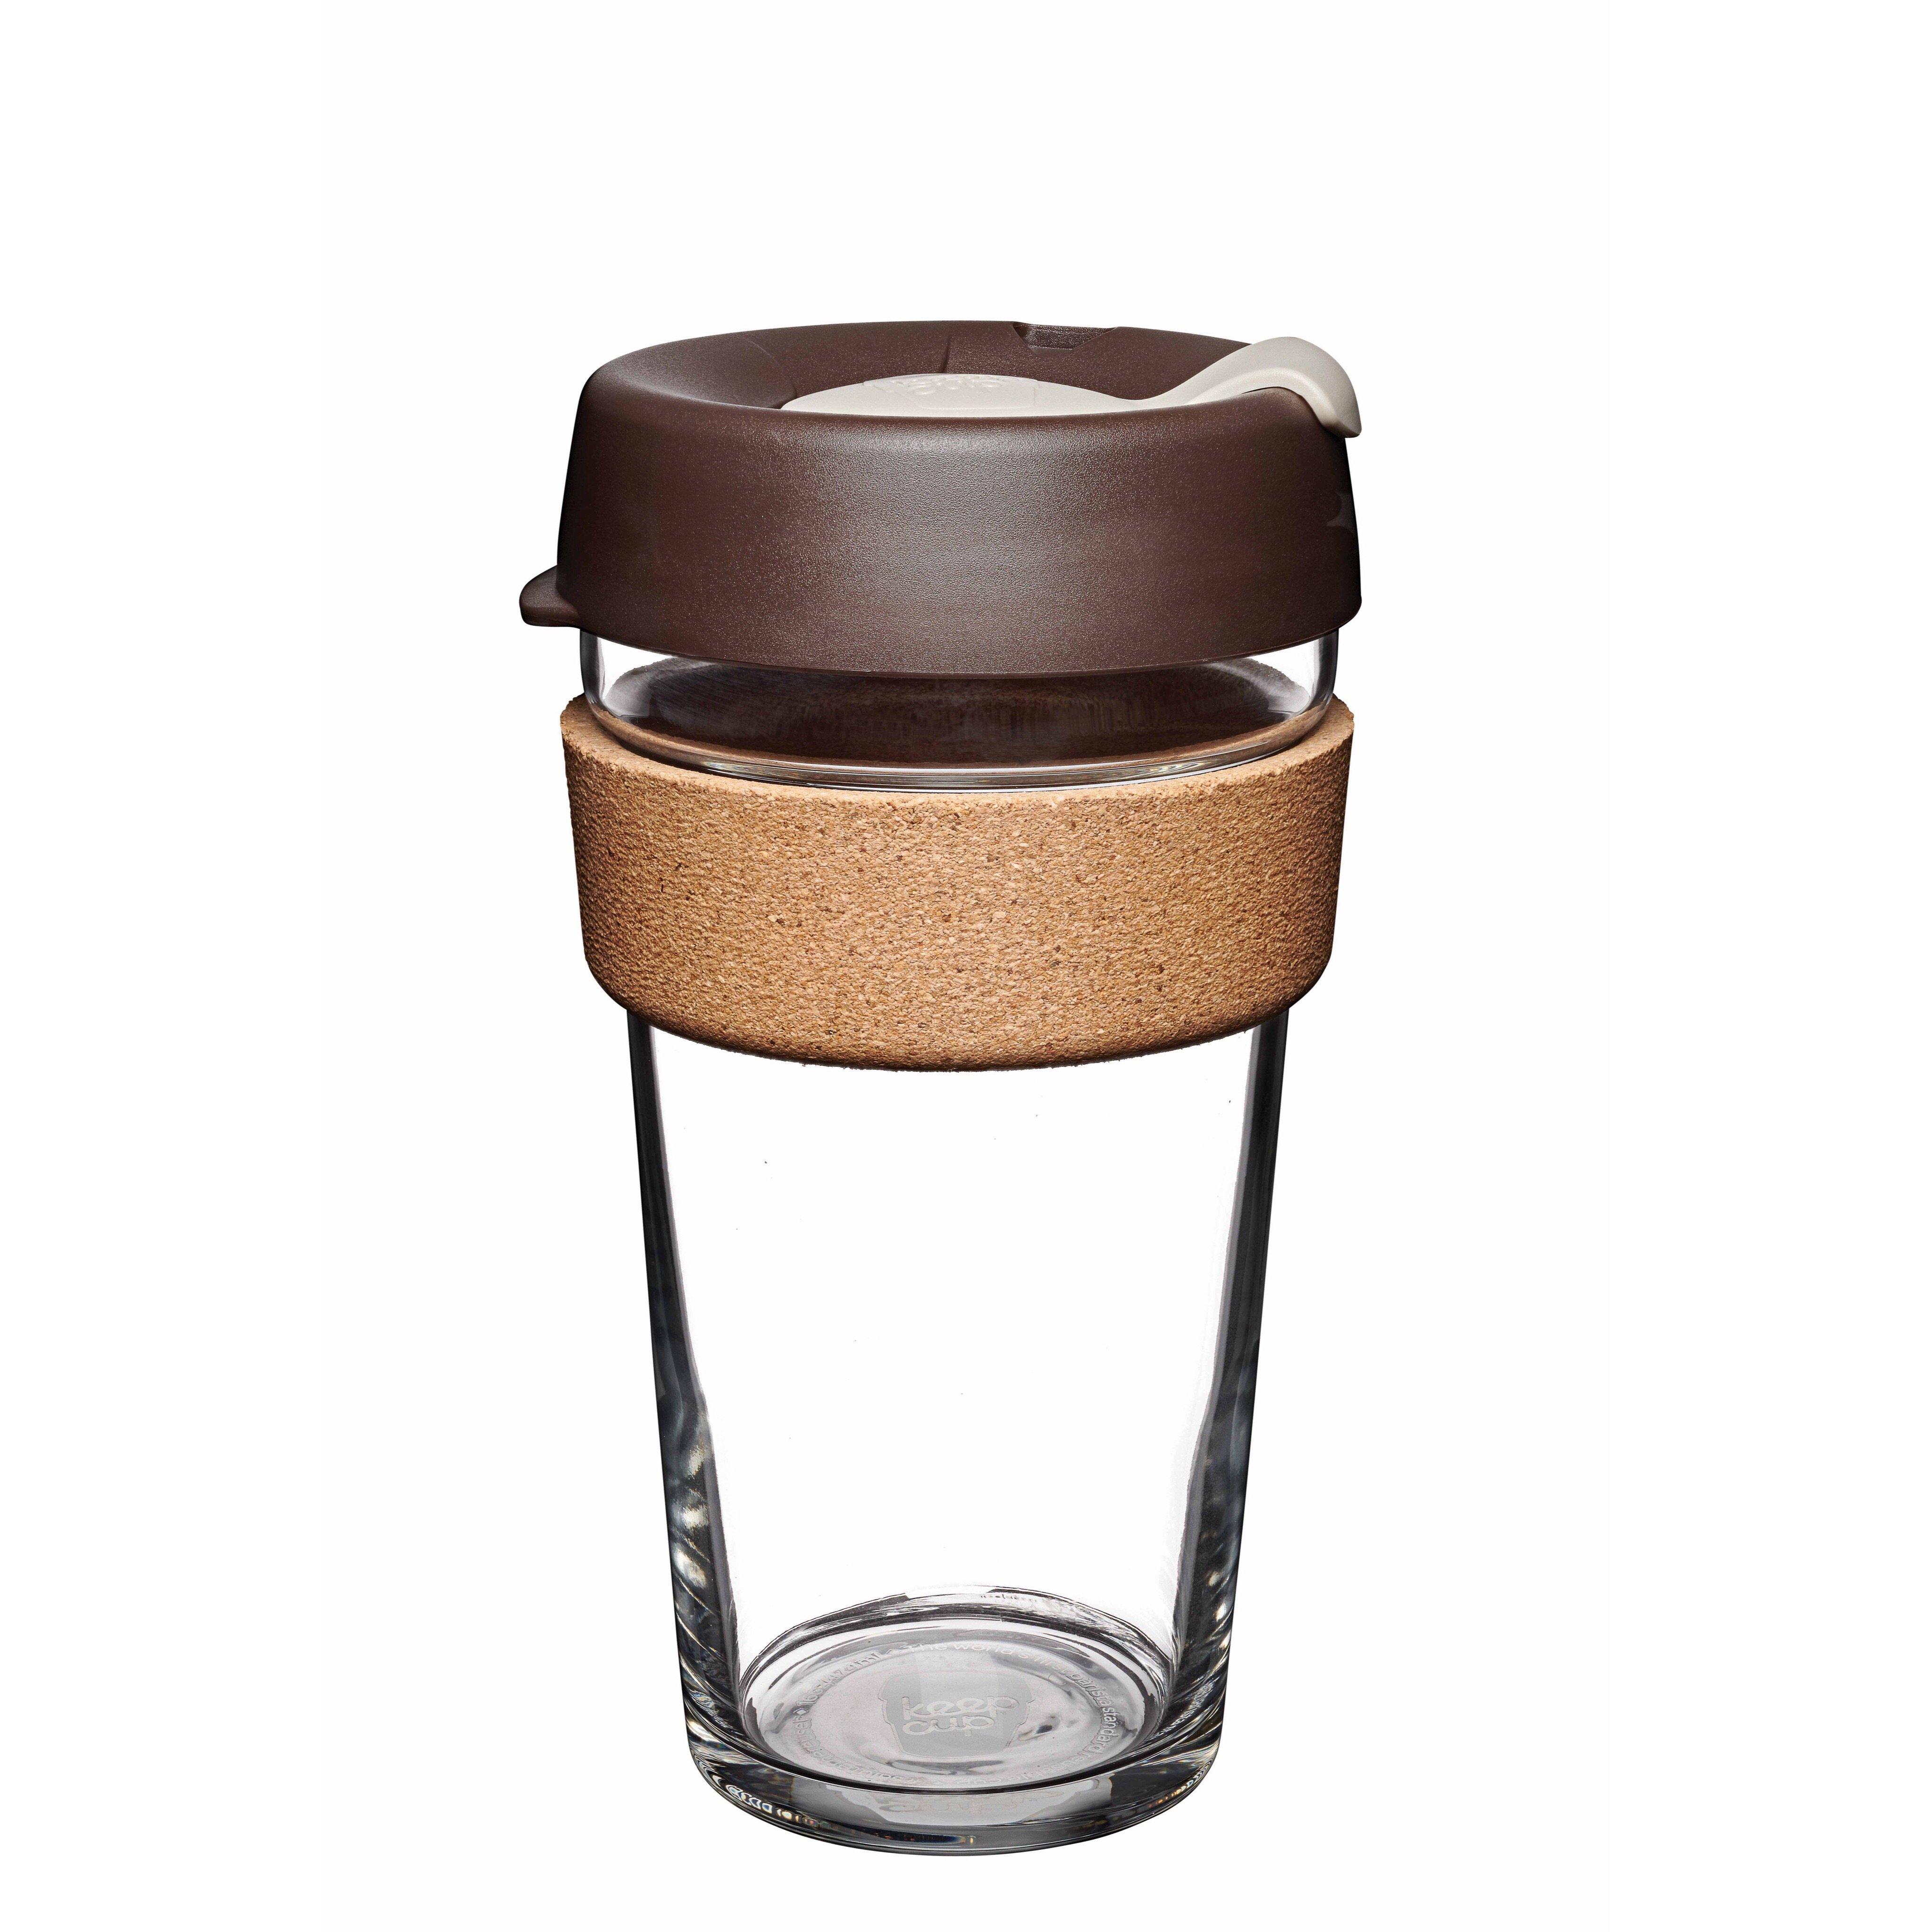 KeepCup Brew Cork 16oz - Almond